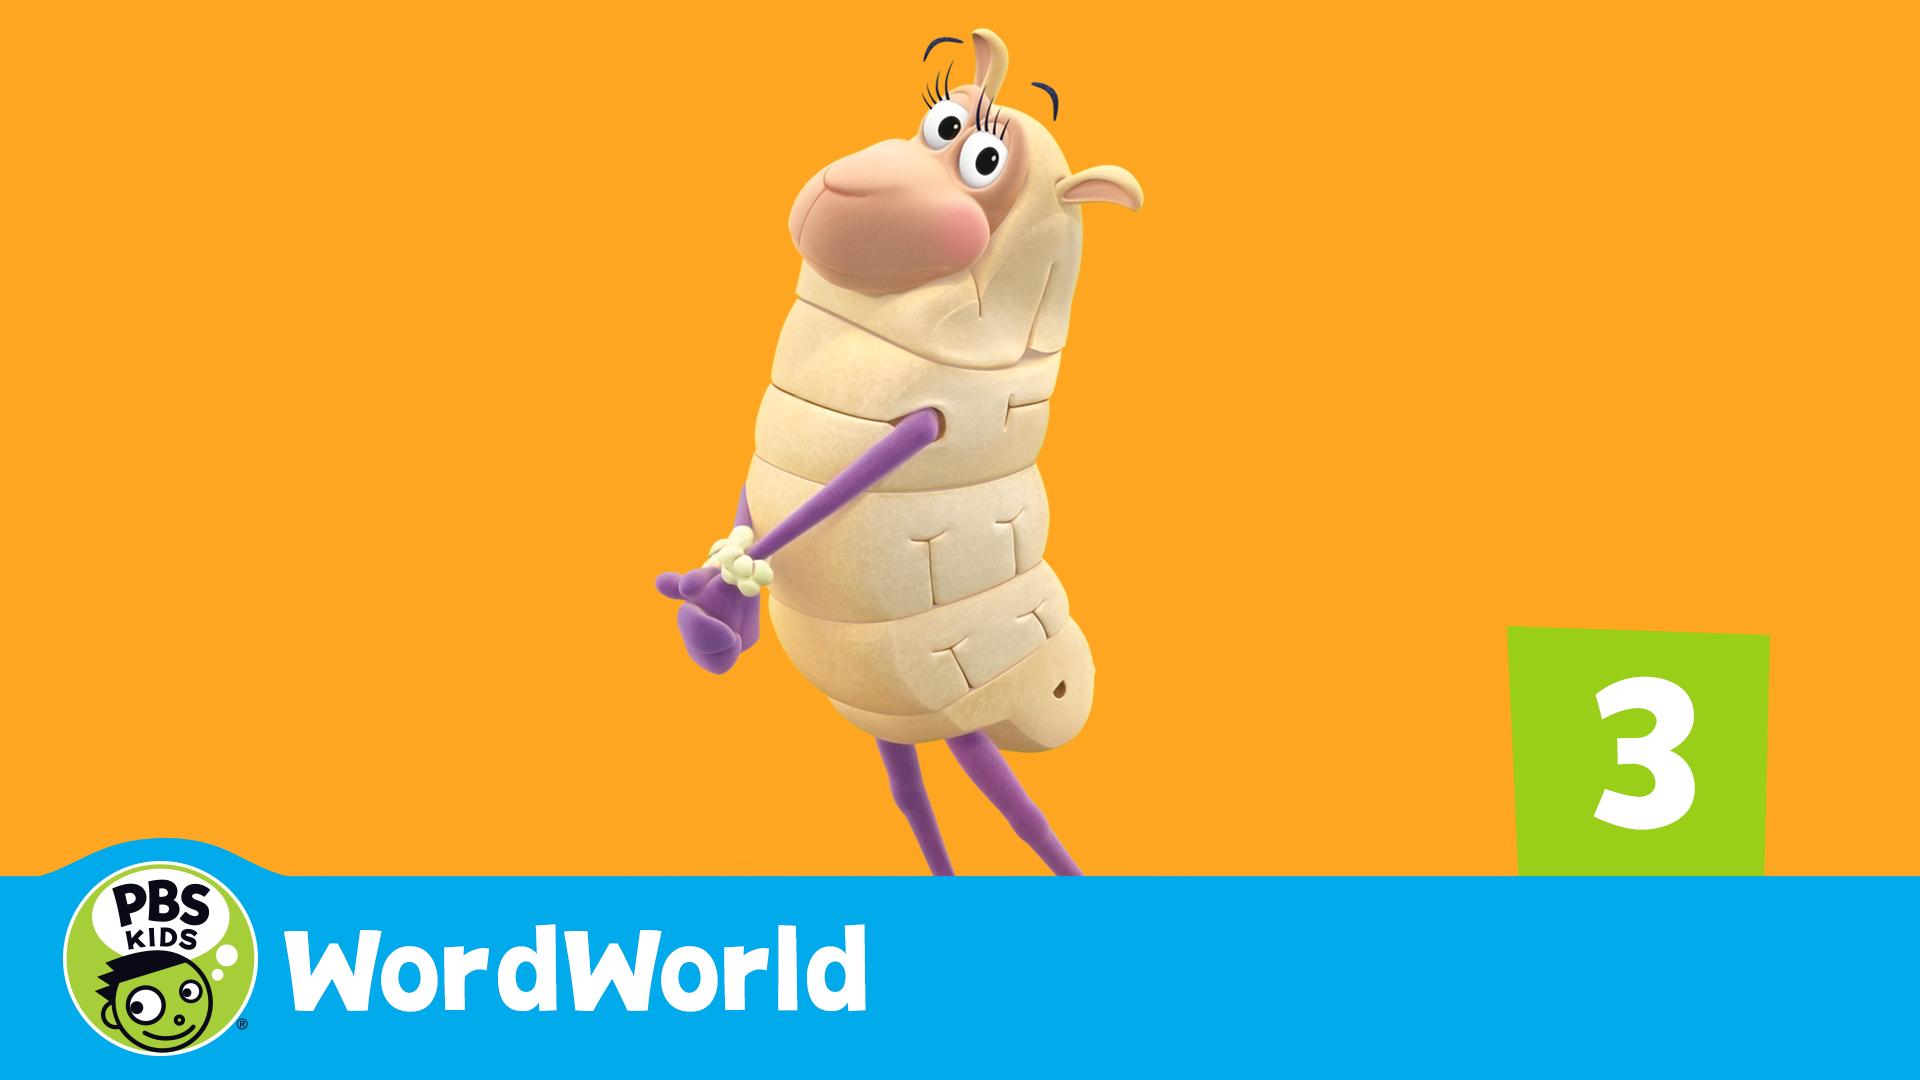 WordWorld Season 3